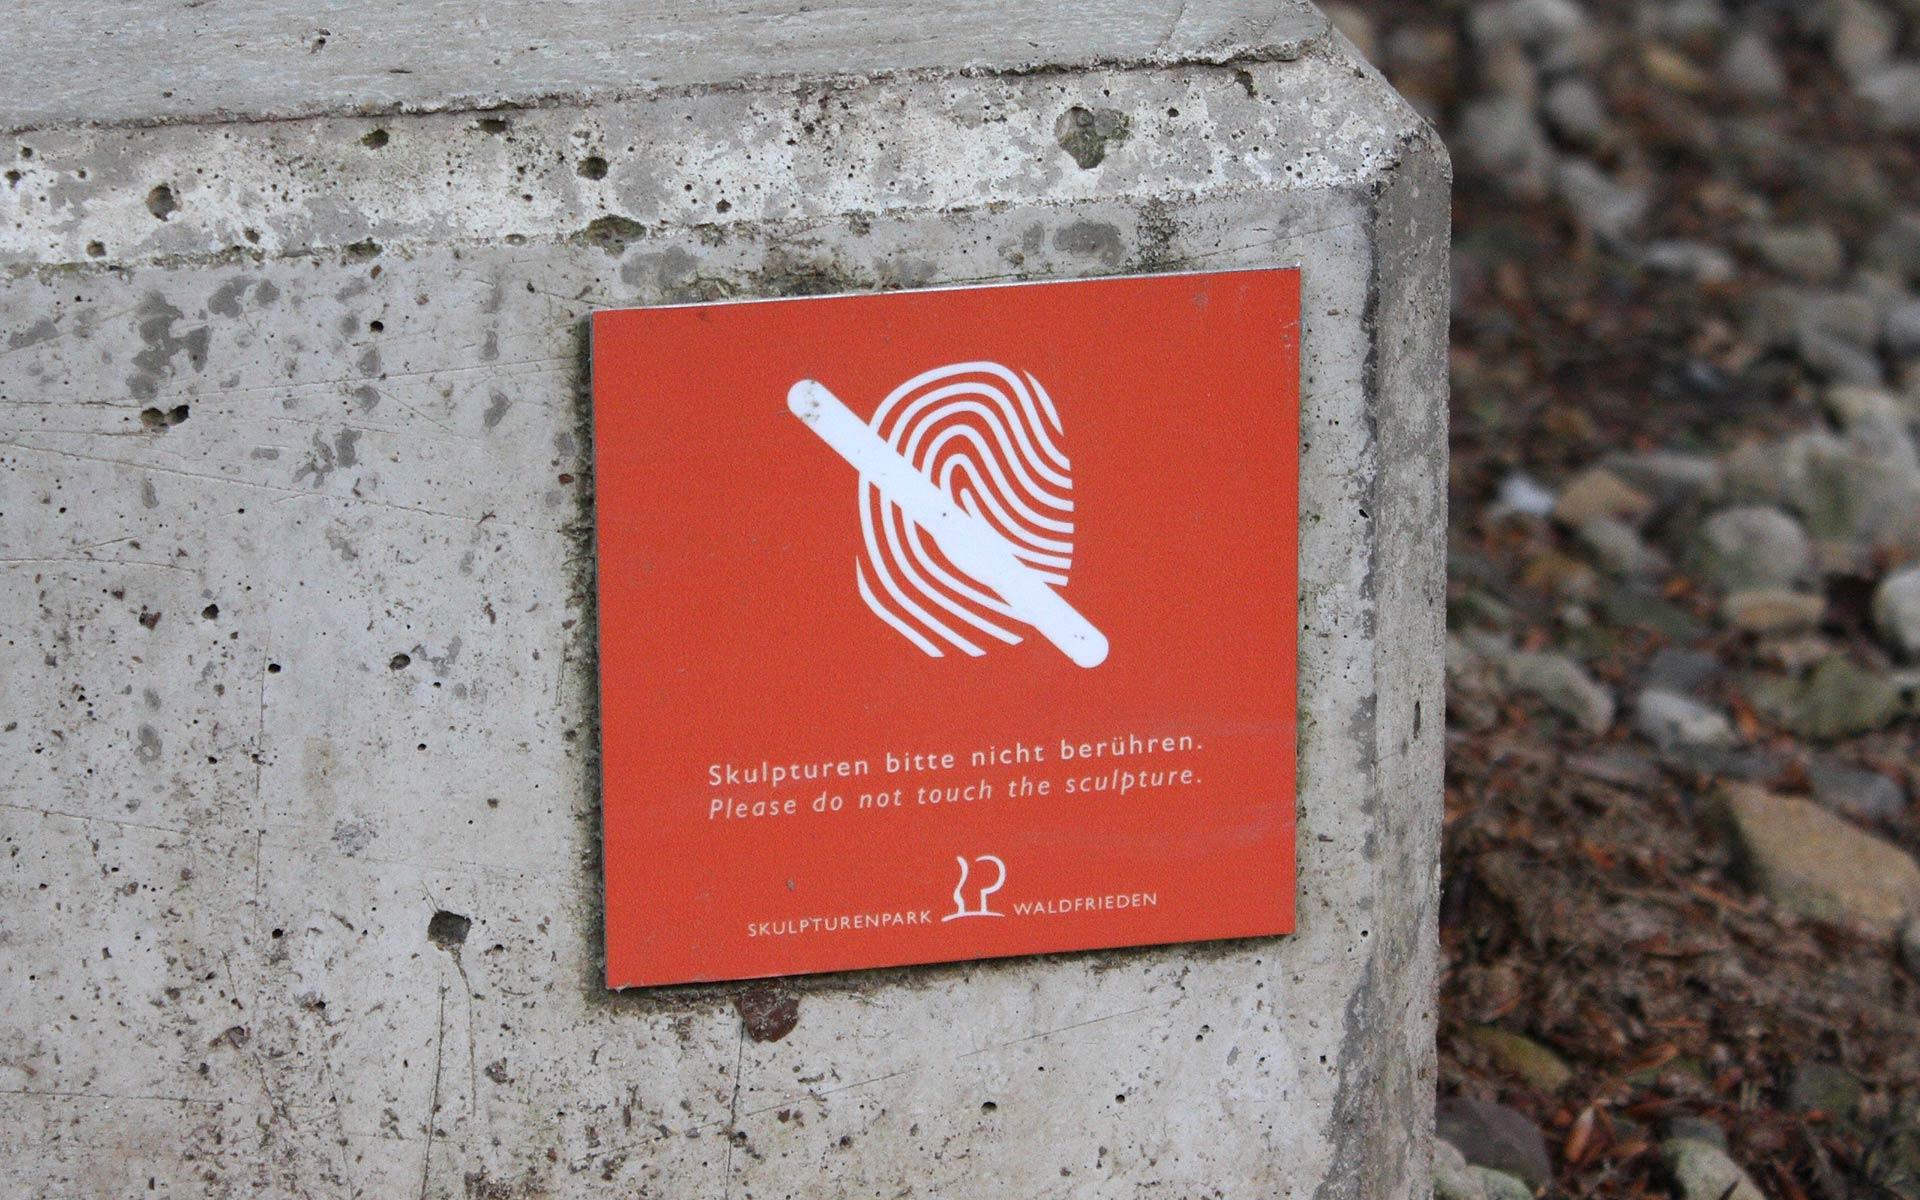 Skulpturenpark Waldfrieden Wuppertal